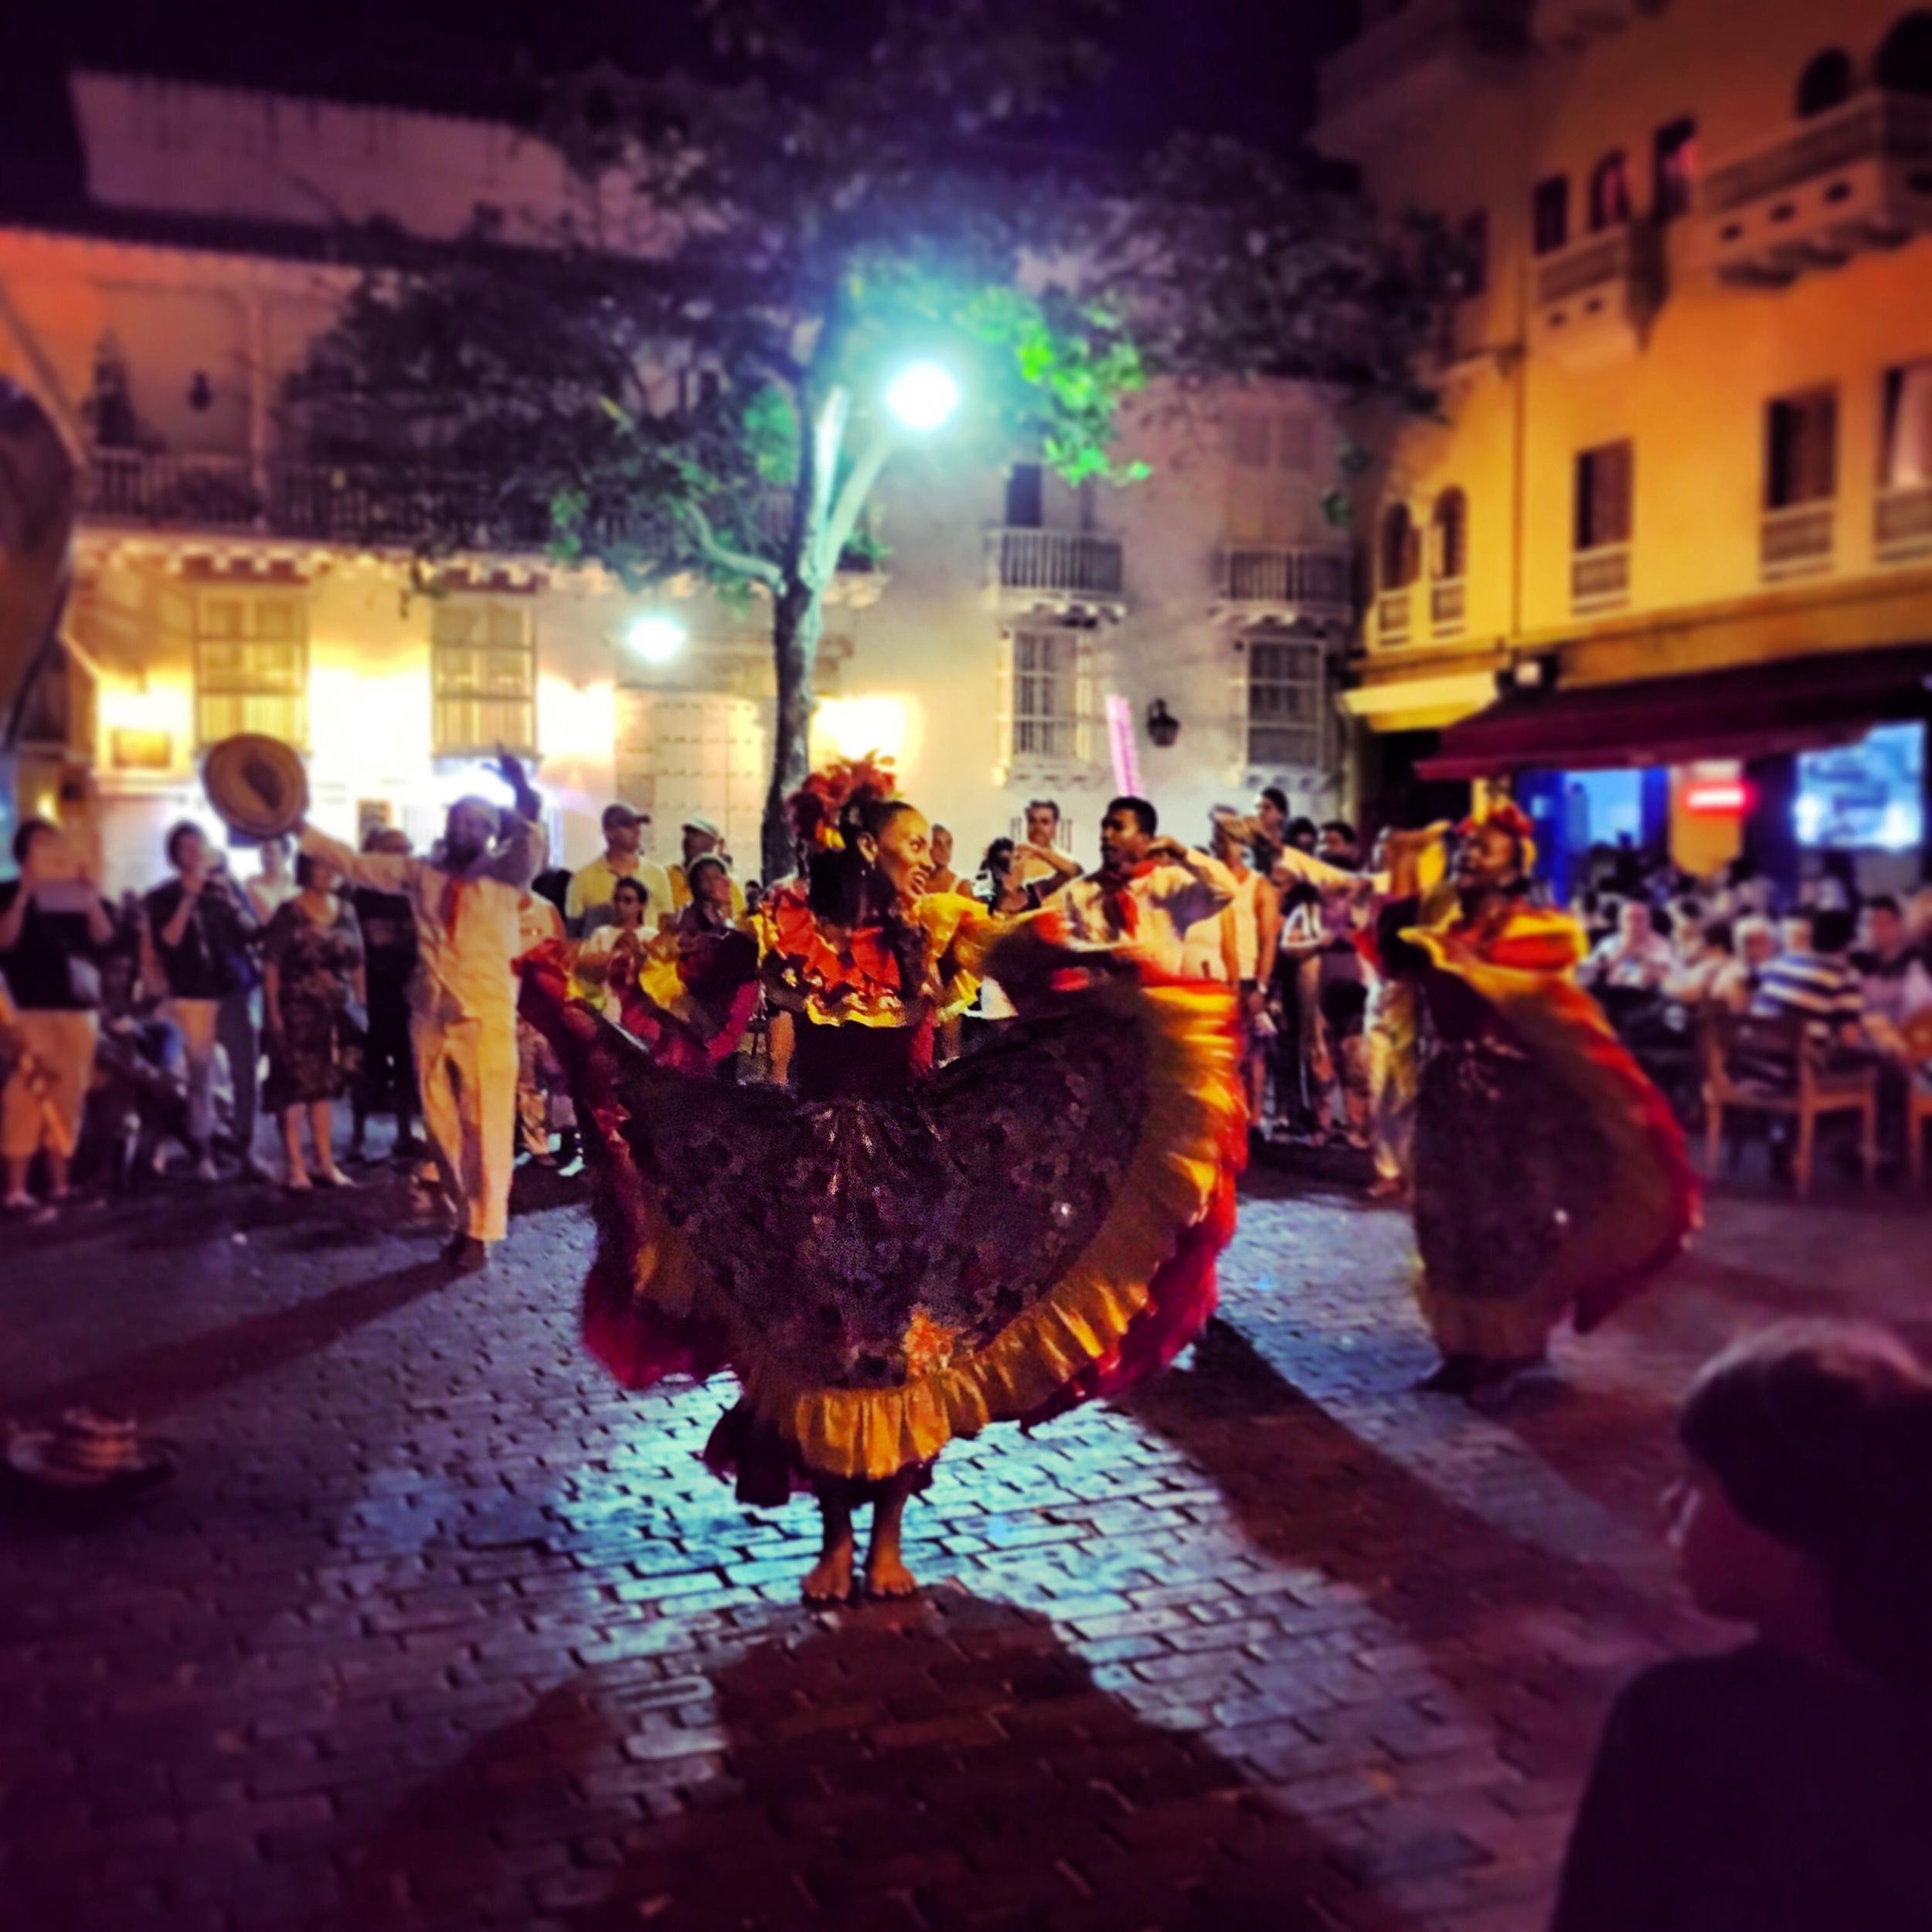 Cartagena Night Life in the Plazas